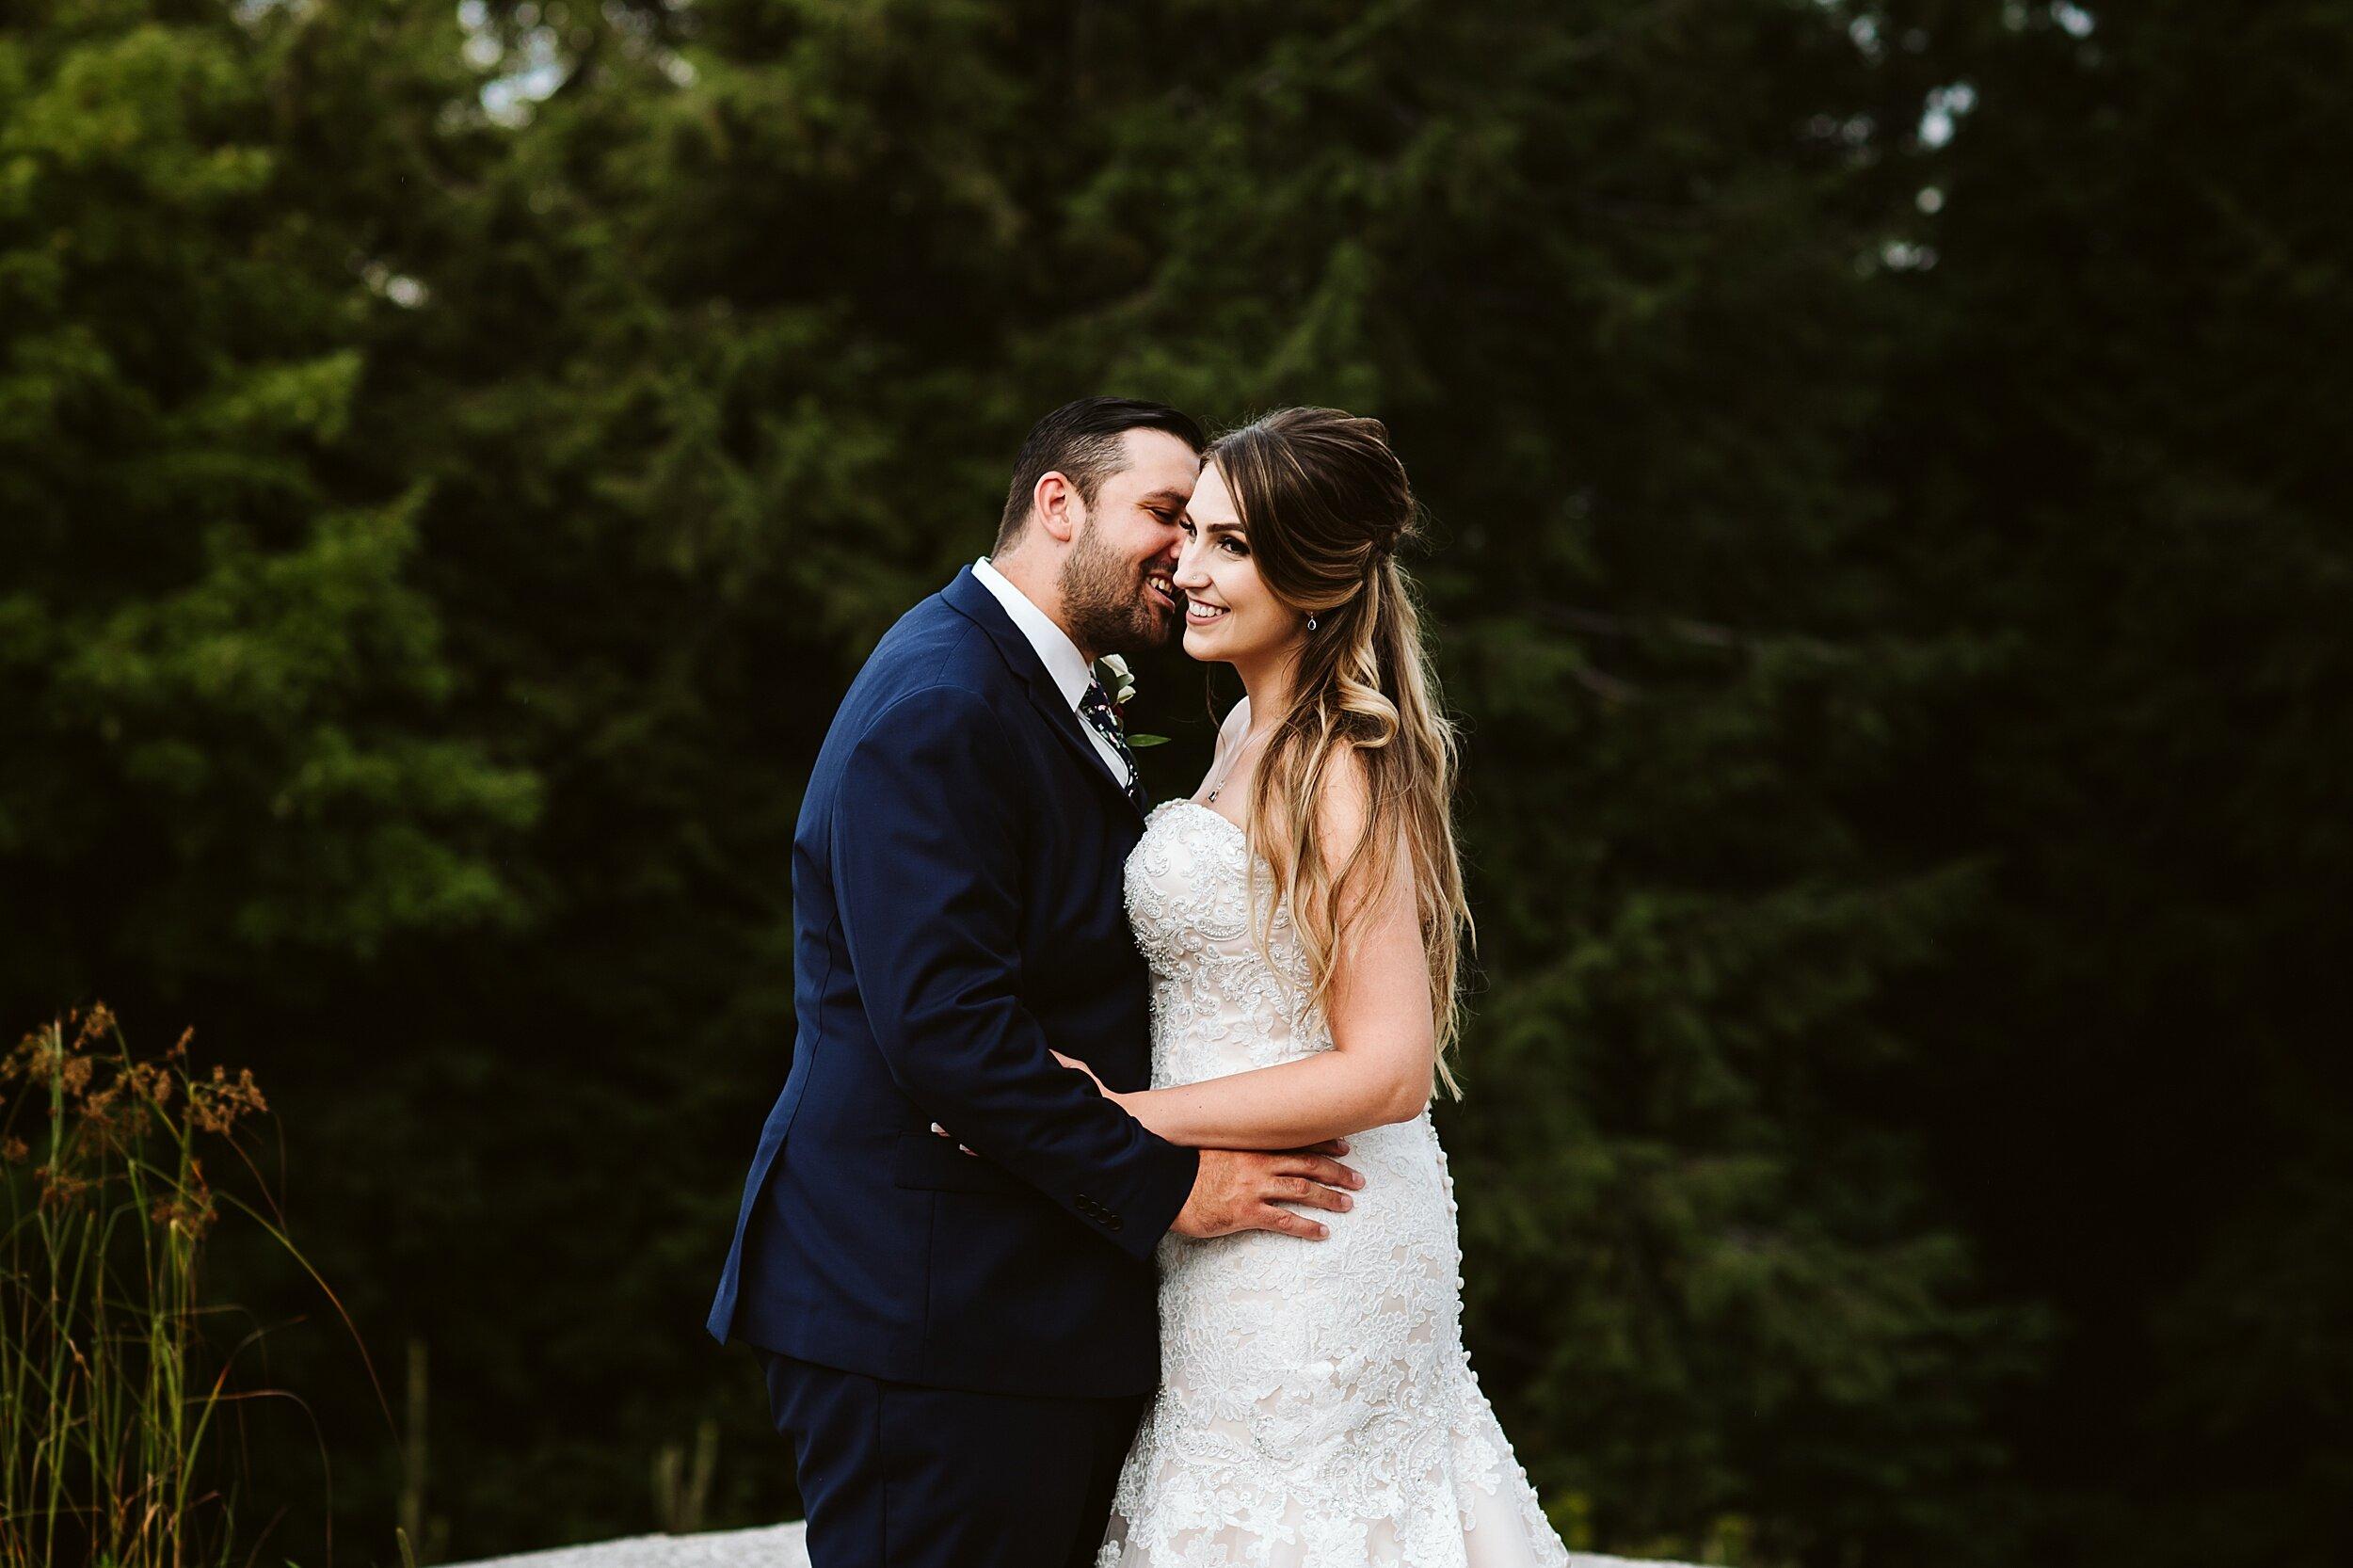 Le_Belvedere_Ottawa_Wakefiel_Quebec_Toronto_Wedding_Photographers_0070.jpg